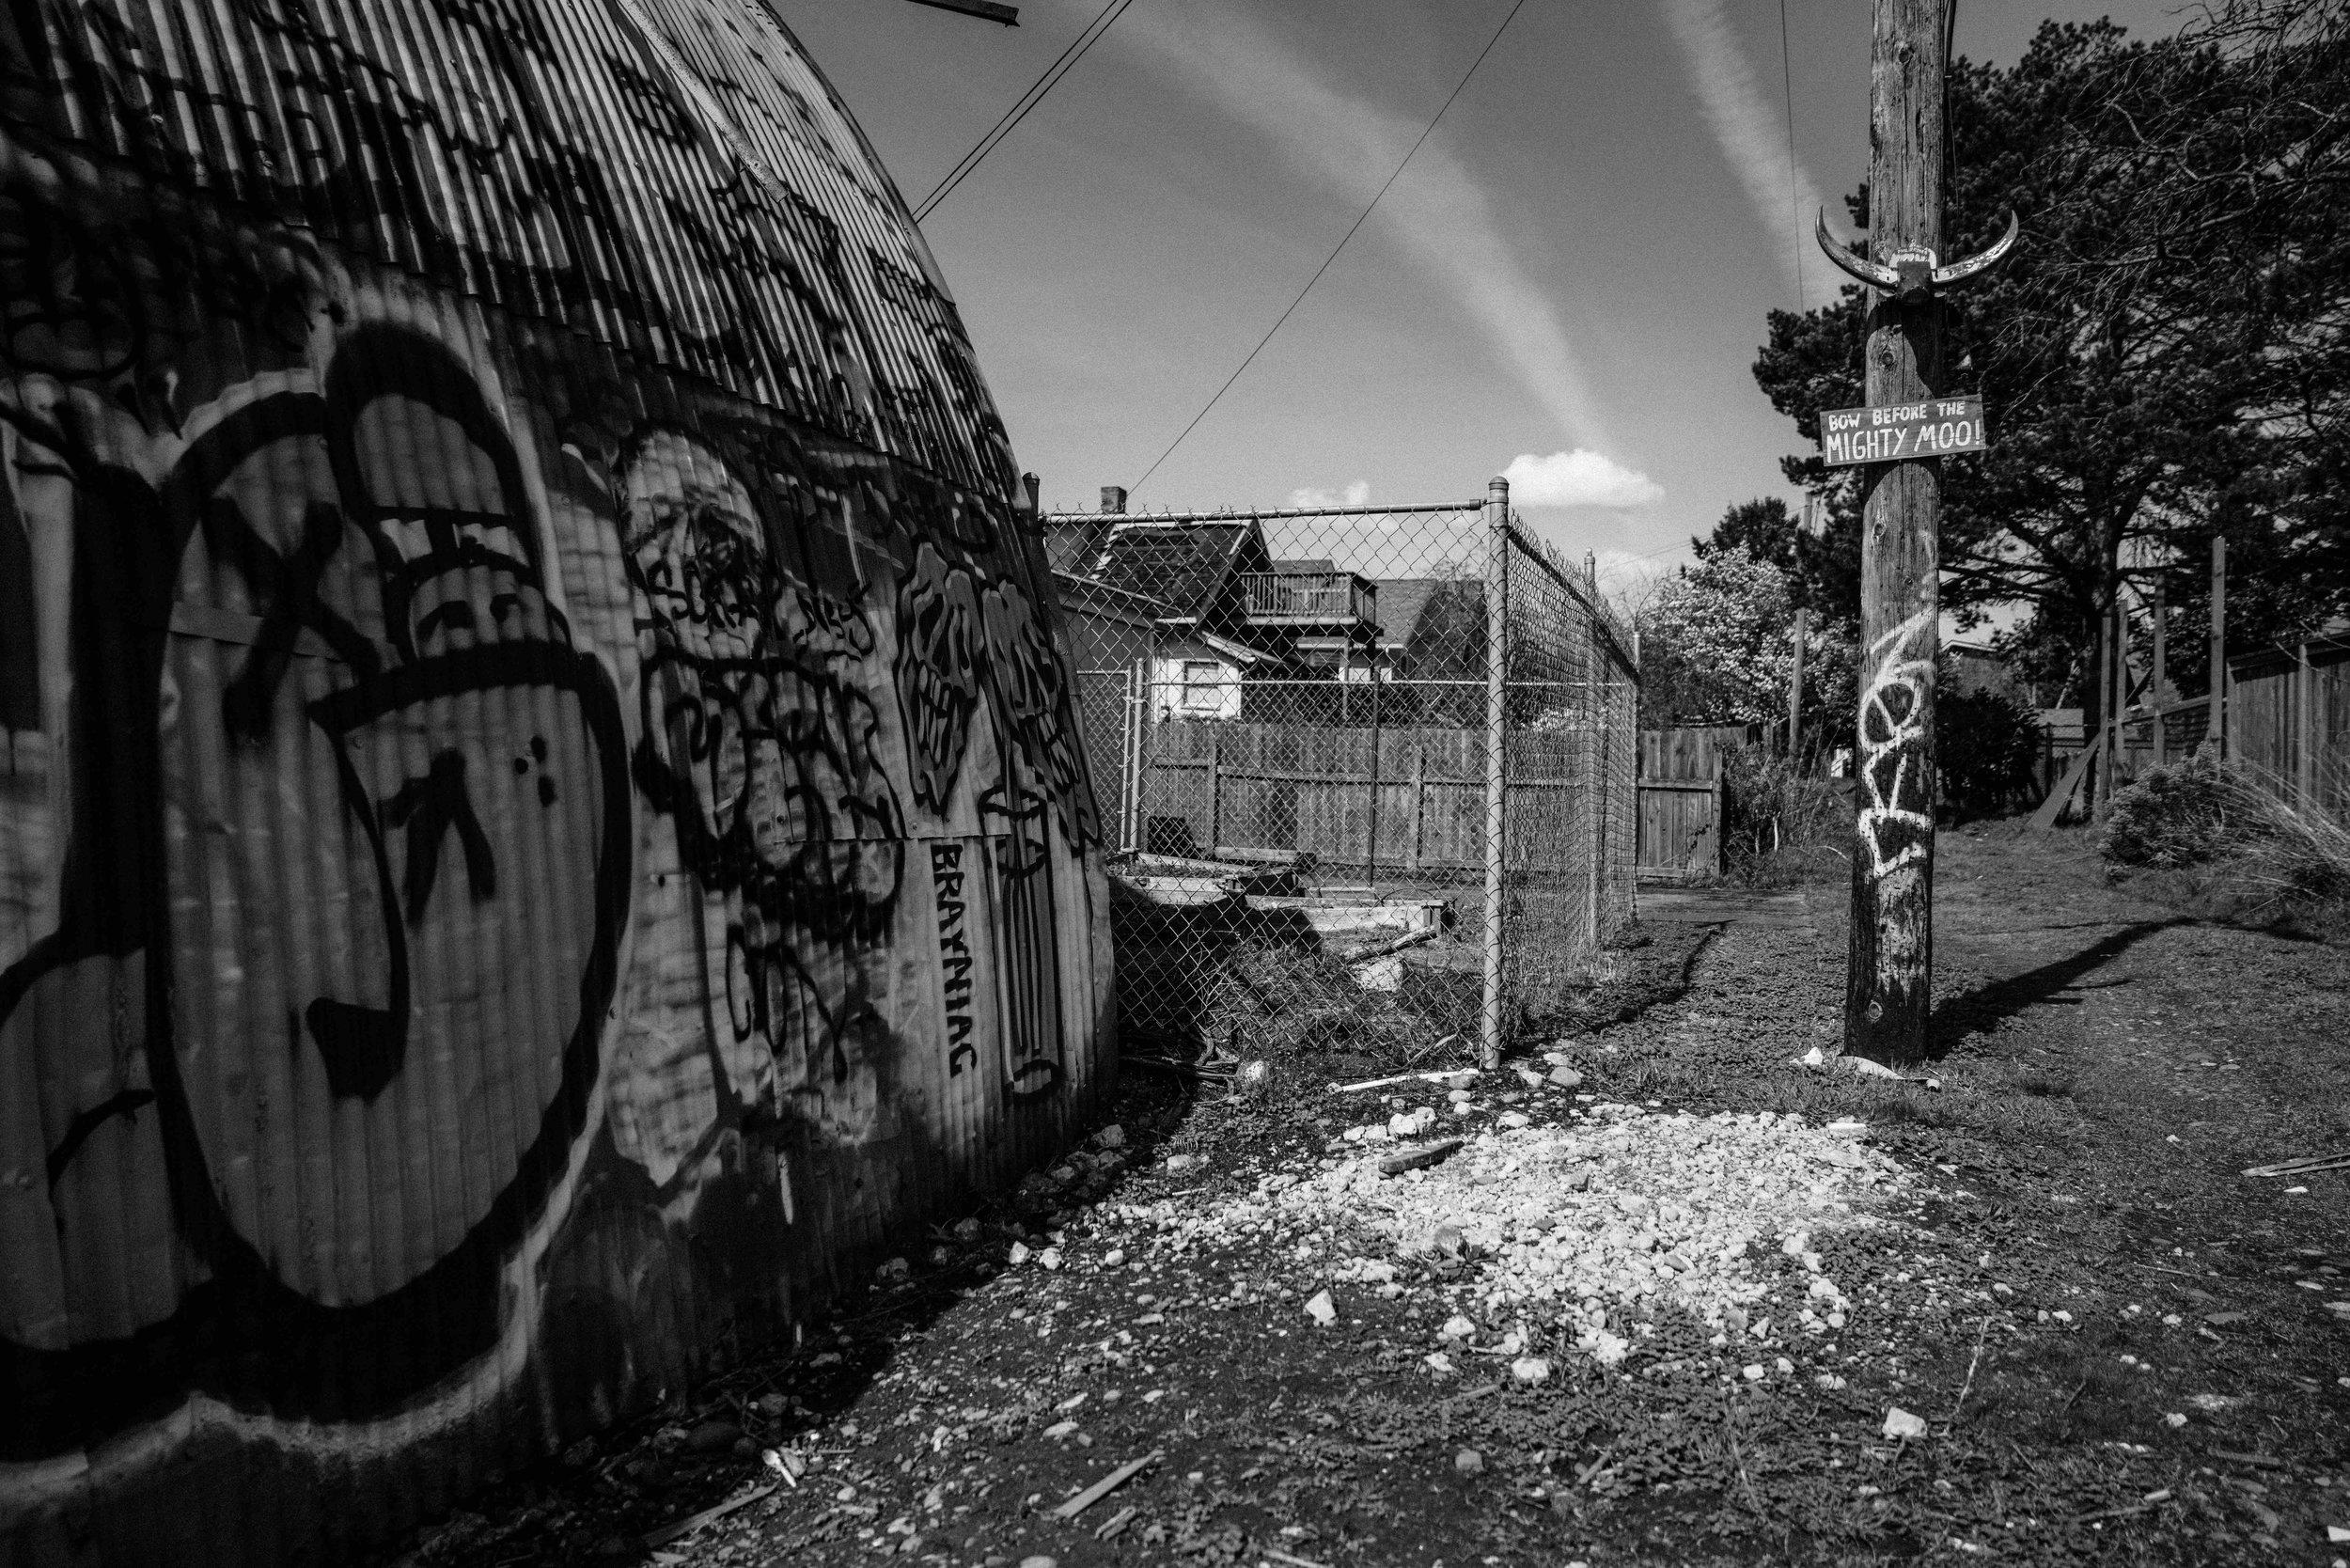 josue-rivas-culture-crush-portland-oregon-graffiti.jpg